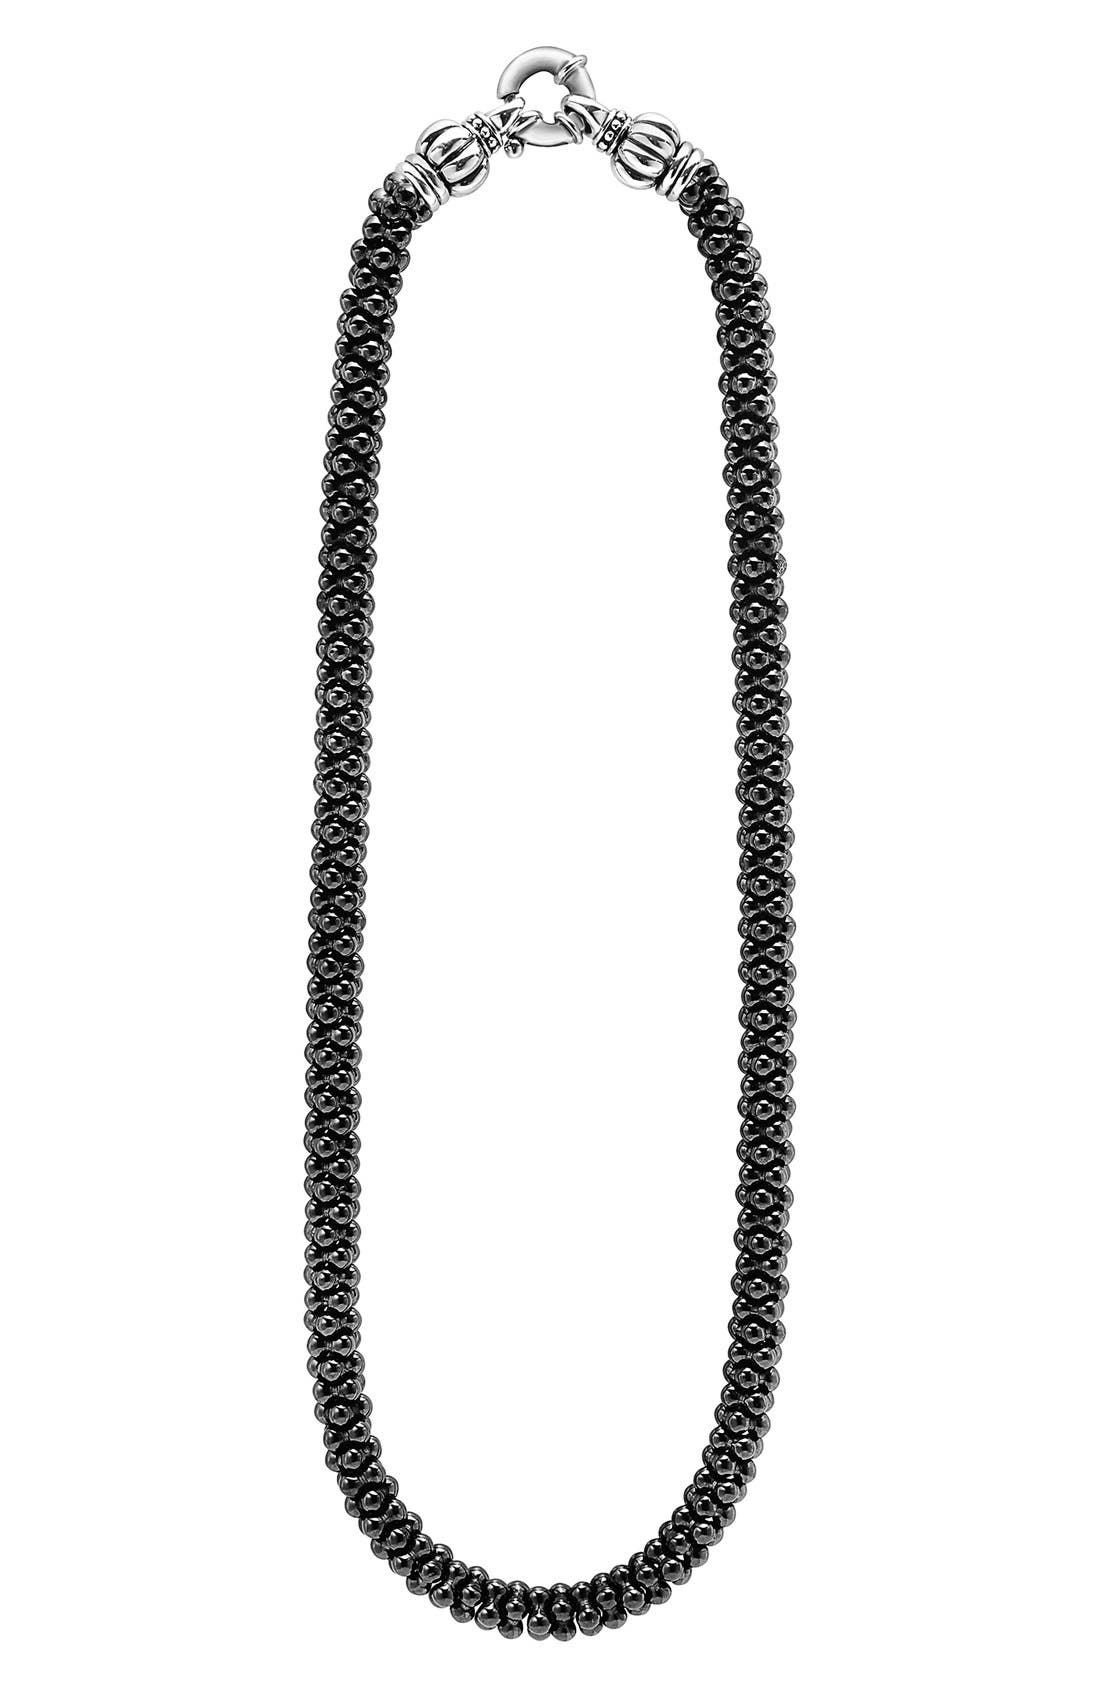 LAGOS 'Black Caviar' 7mm Beaded Necklace